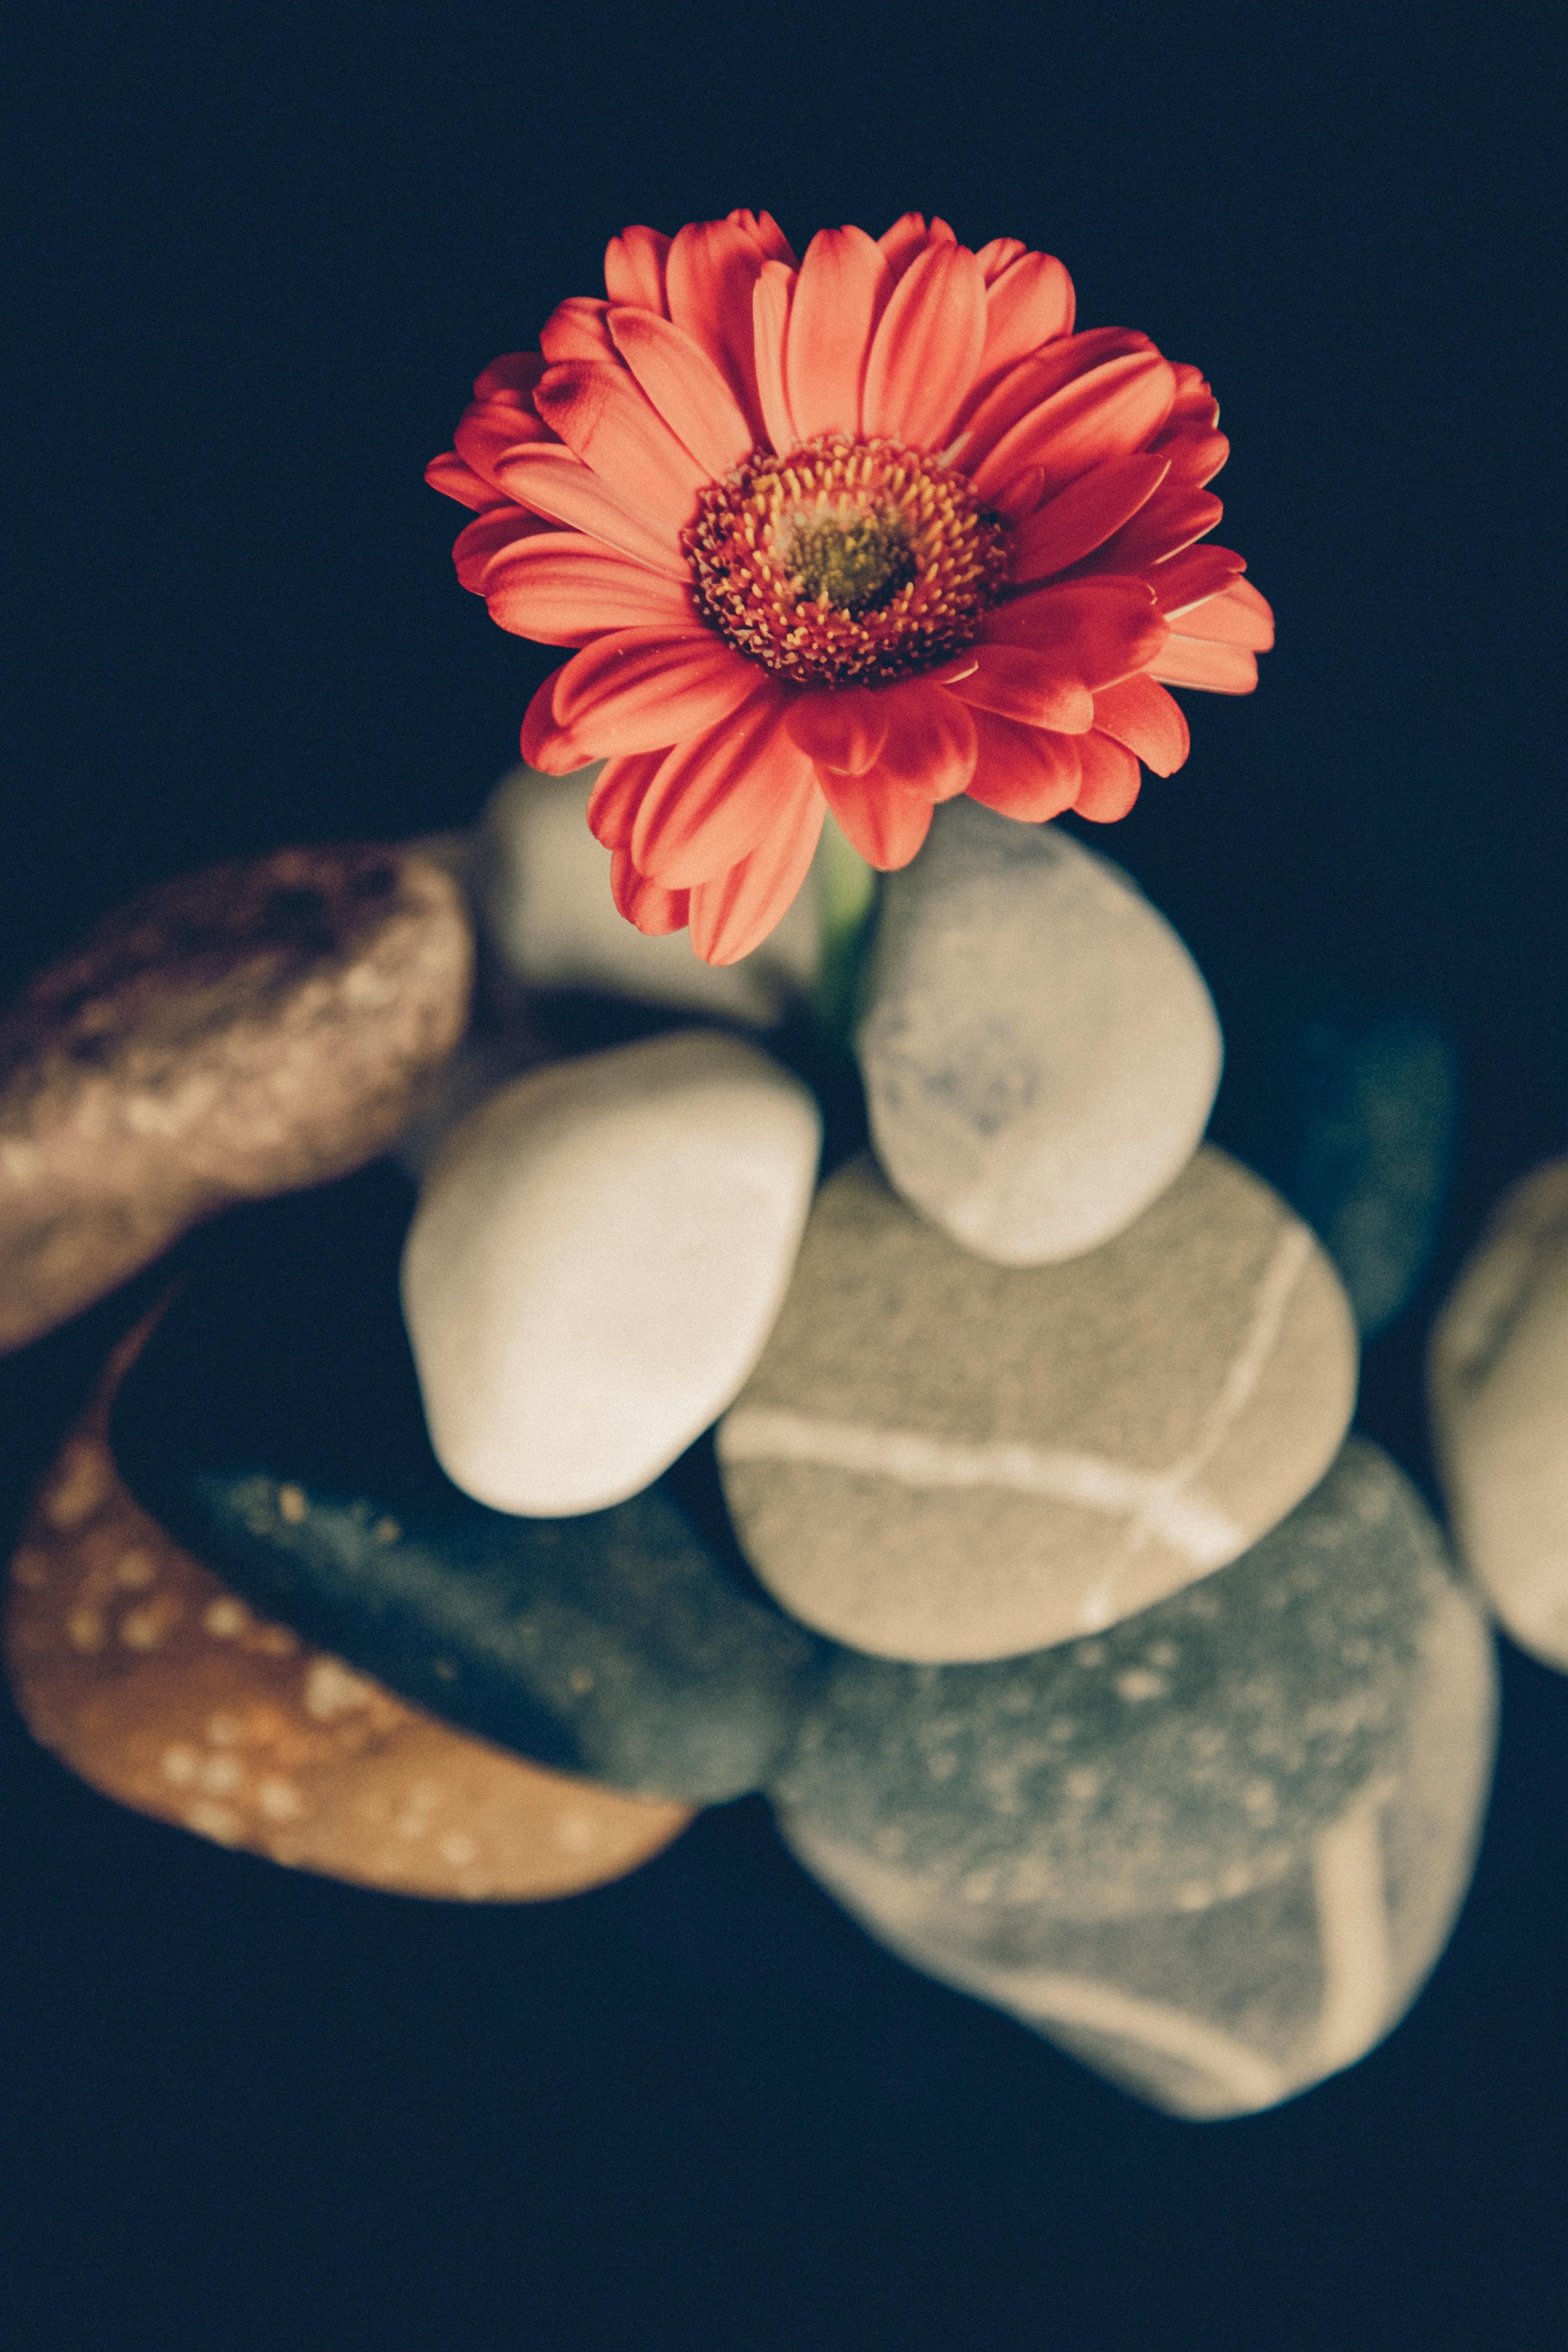 Камень цветок картинки